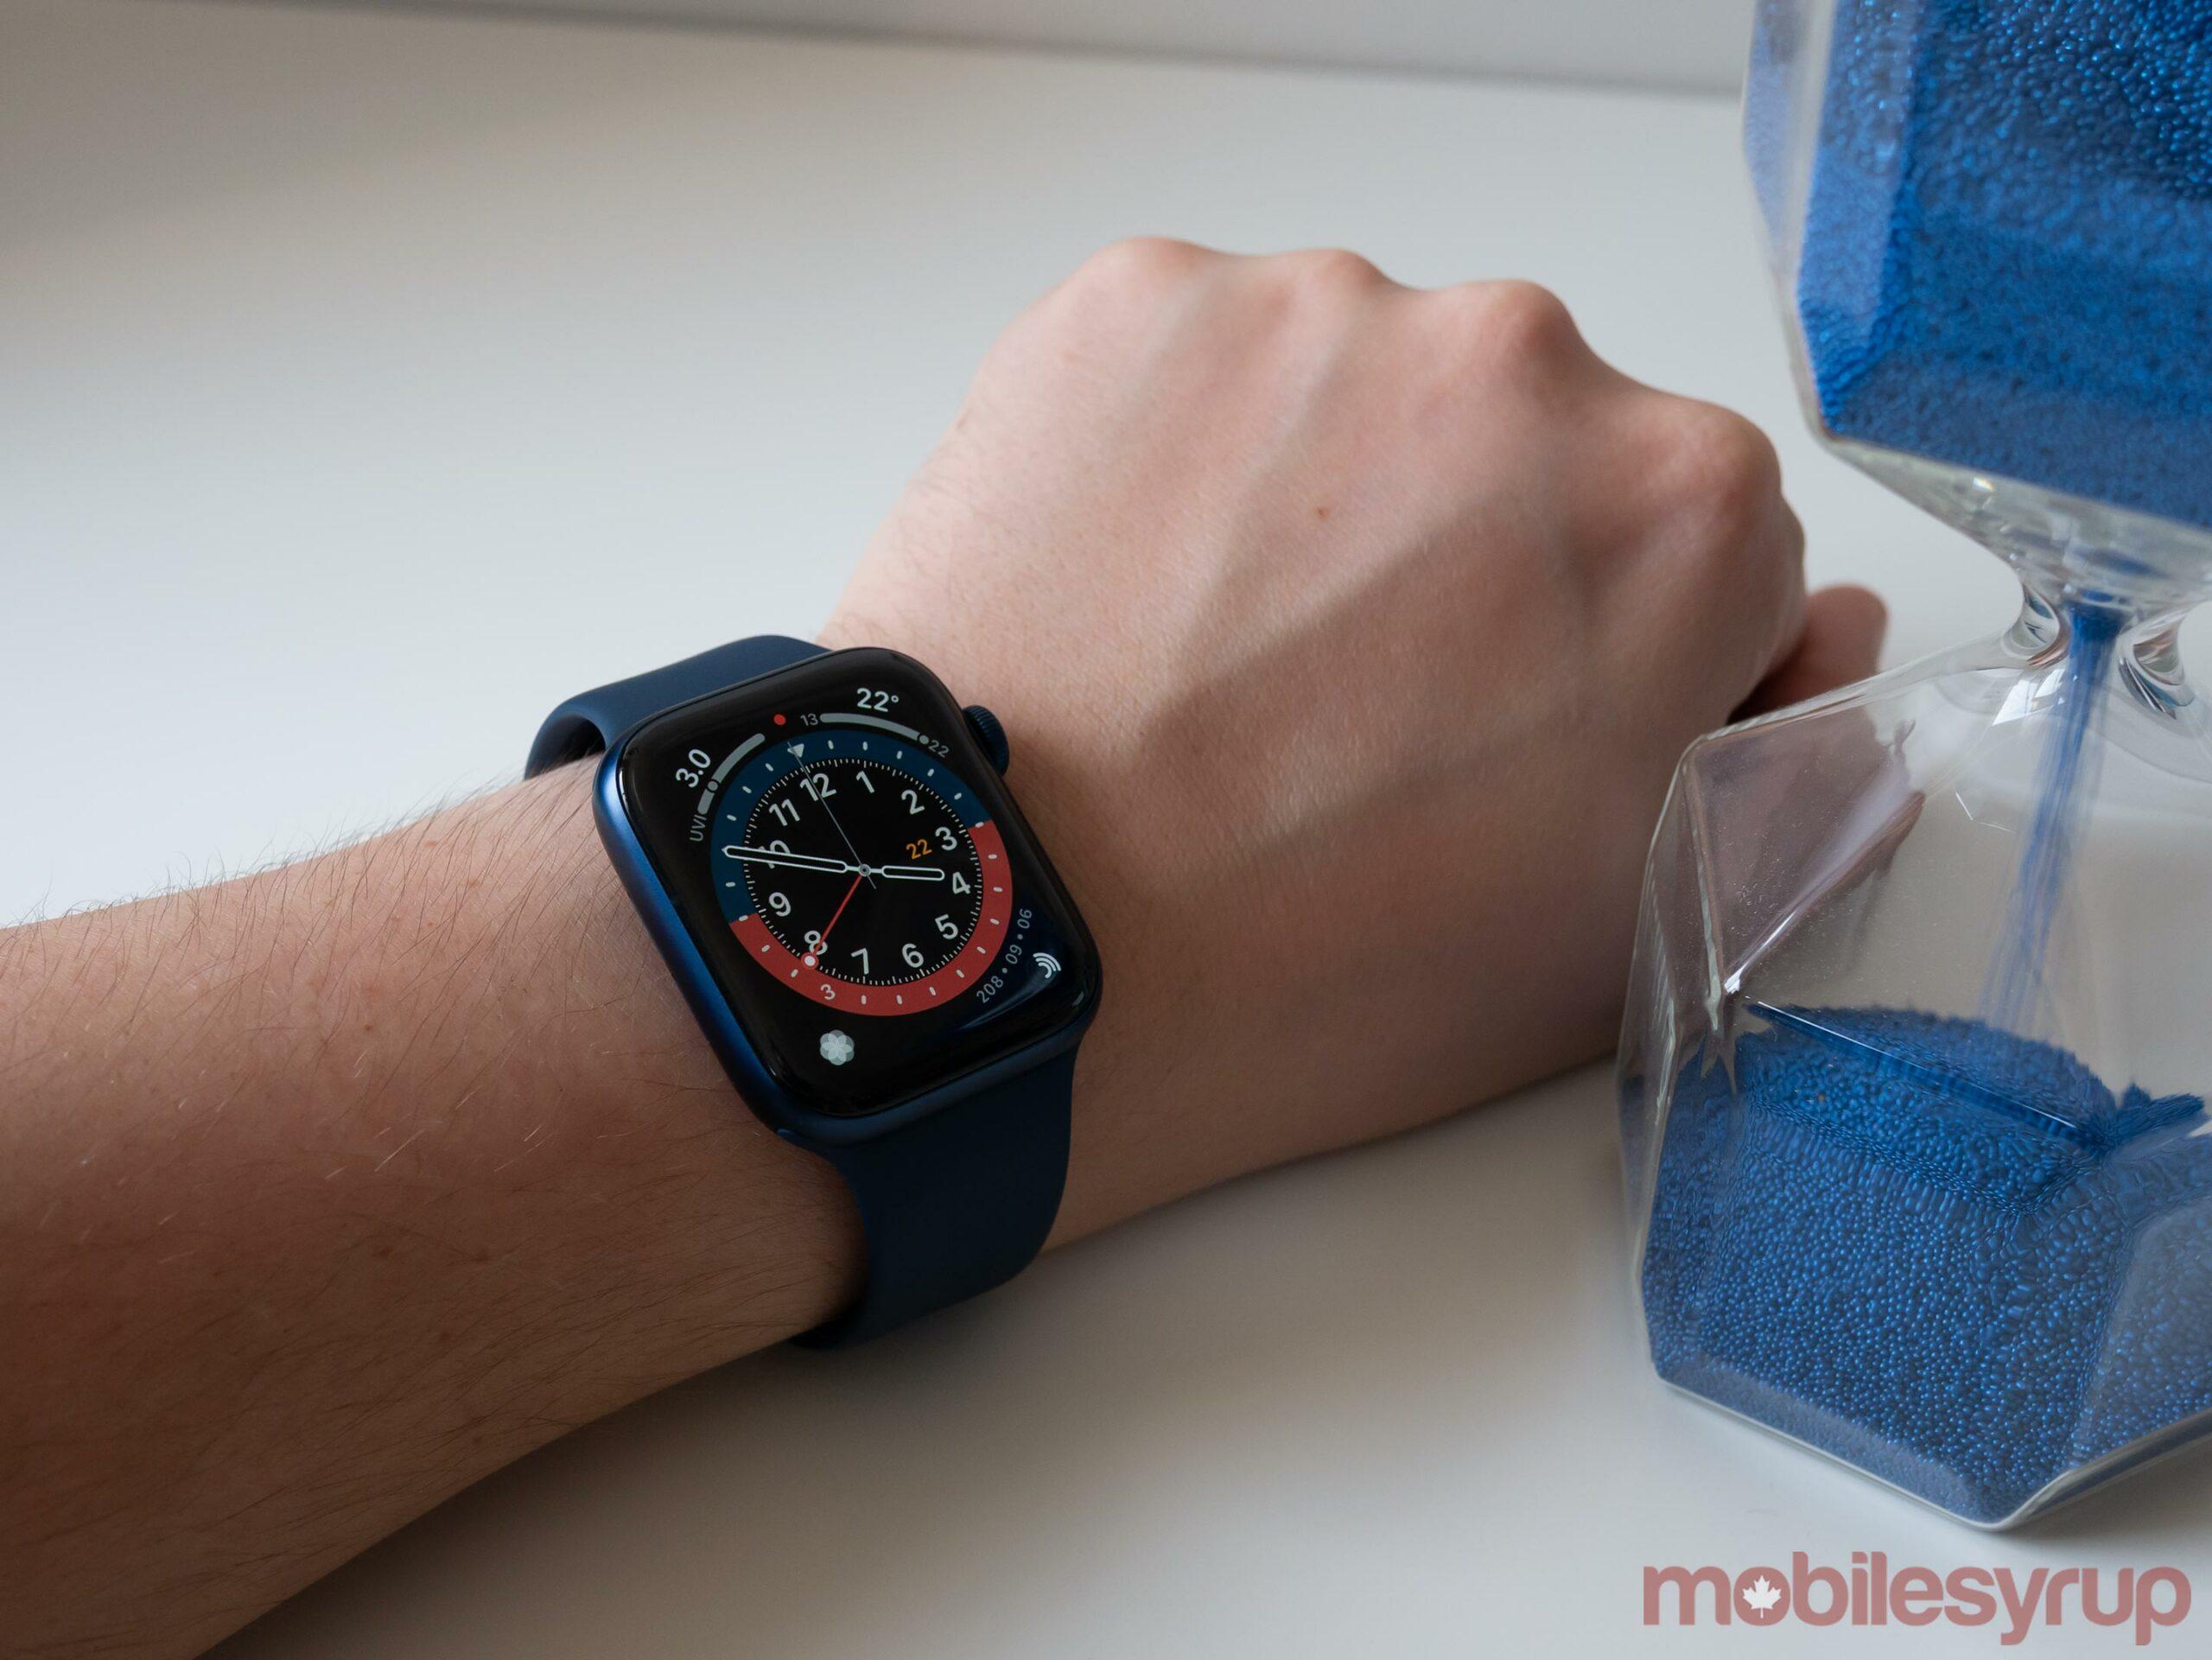 Apple Watch Series 6 GMT Watch Face